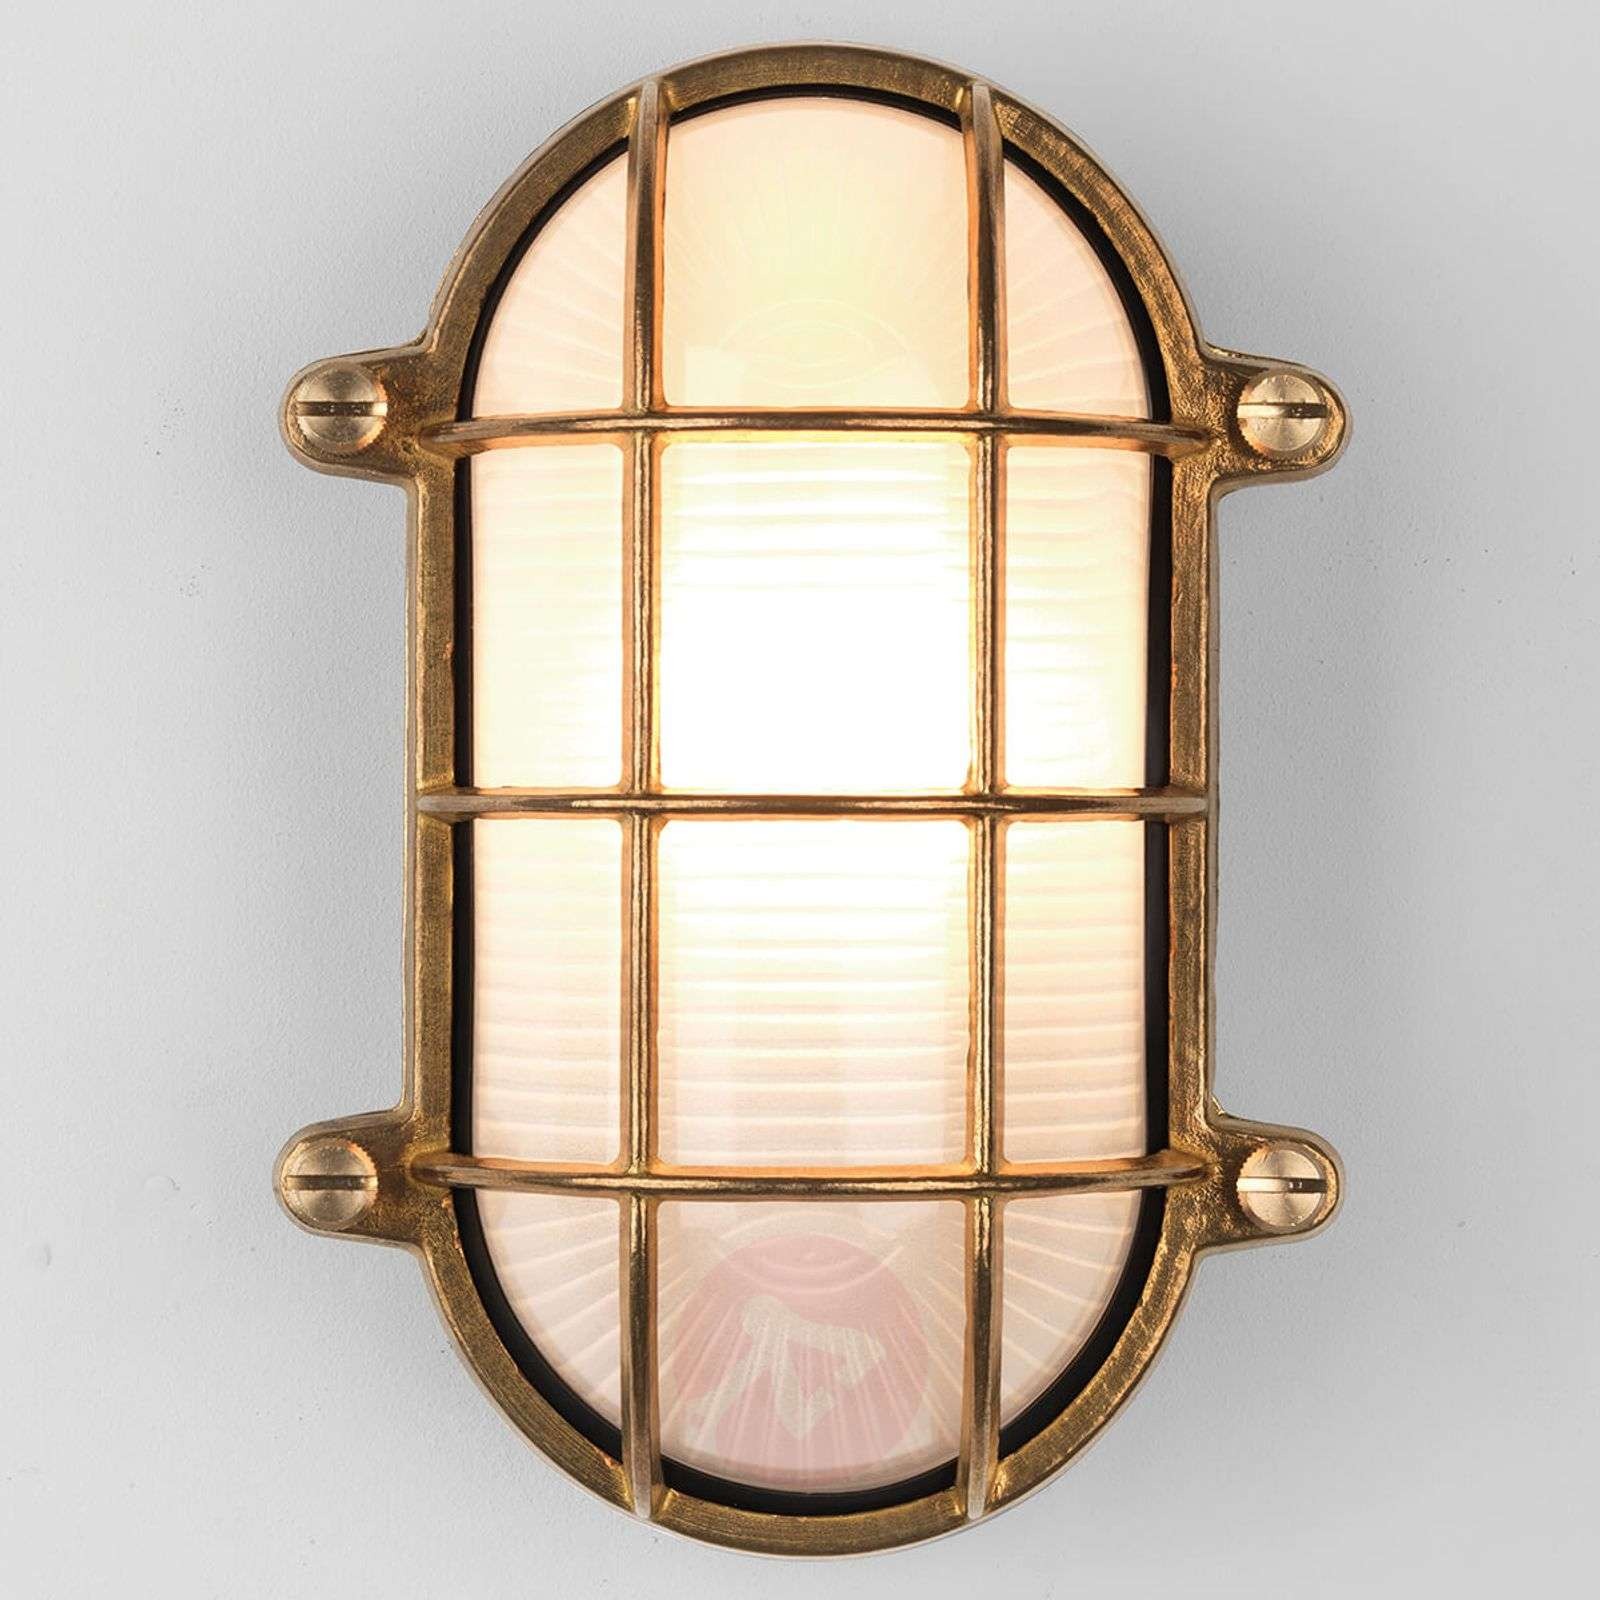 Brass-coloured Thurso Oval outdoor wall light-1020582-01